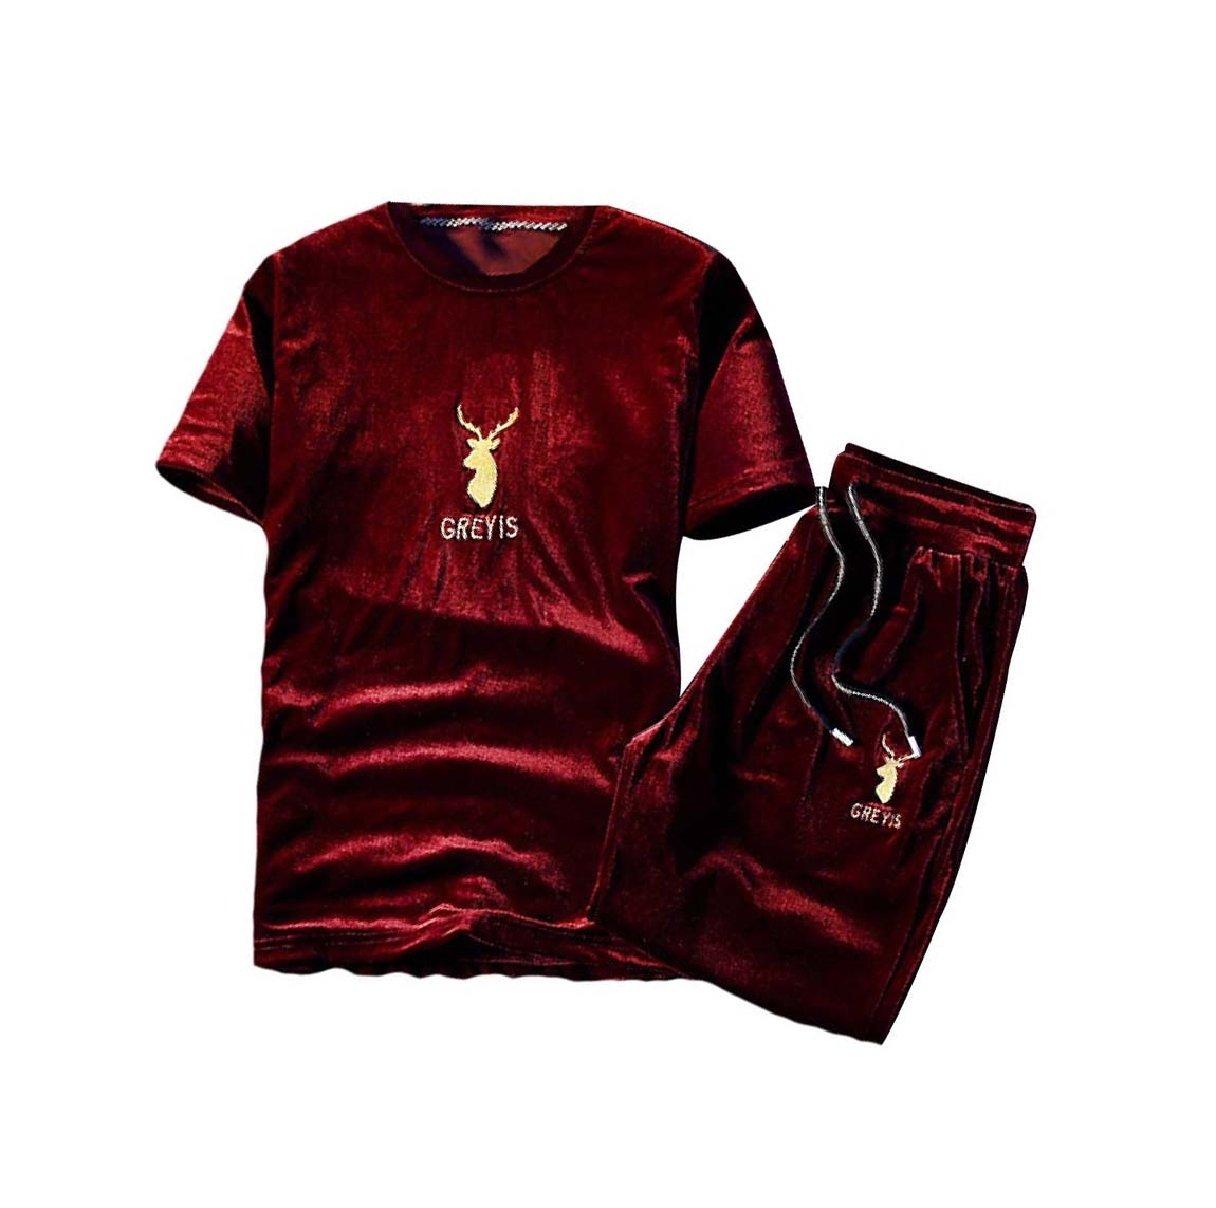 Tootless-Men Summer Half Pants Relaxed Short-Sleeve Velvet Sweatsuit Set Red L